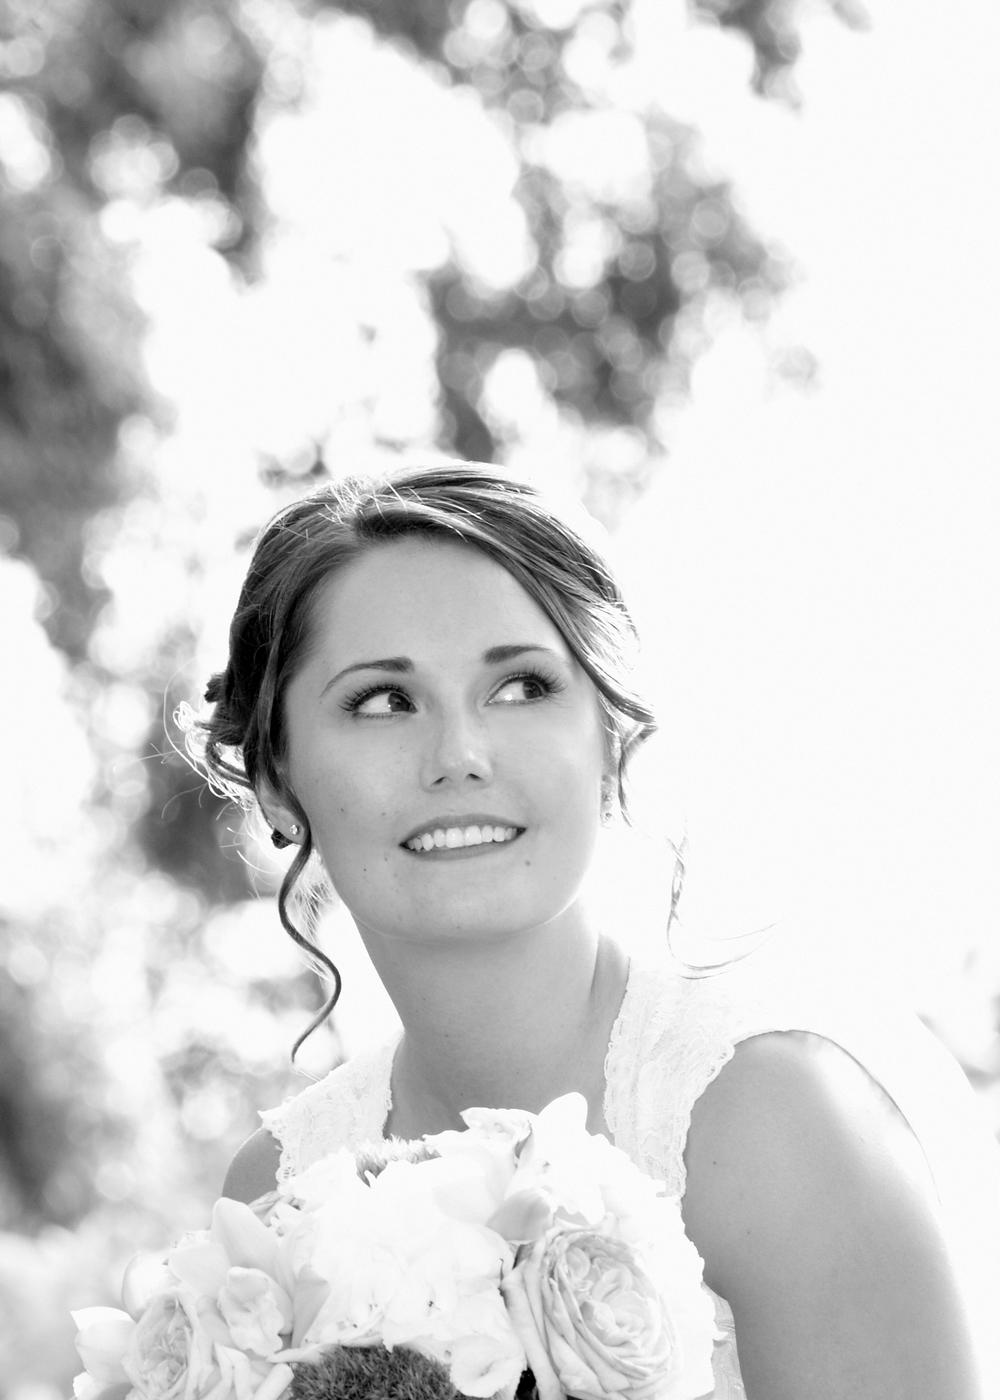 Wedding Photographer Cindy Moleski Photography A Saskatoon Photographer Specializing In